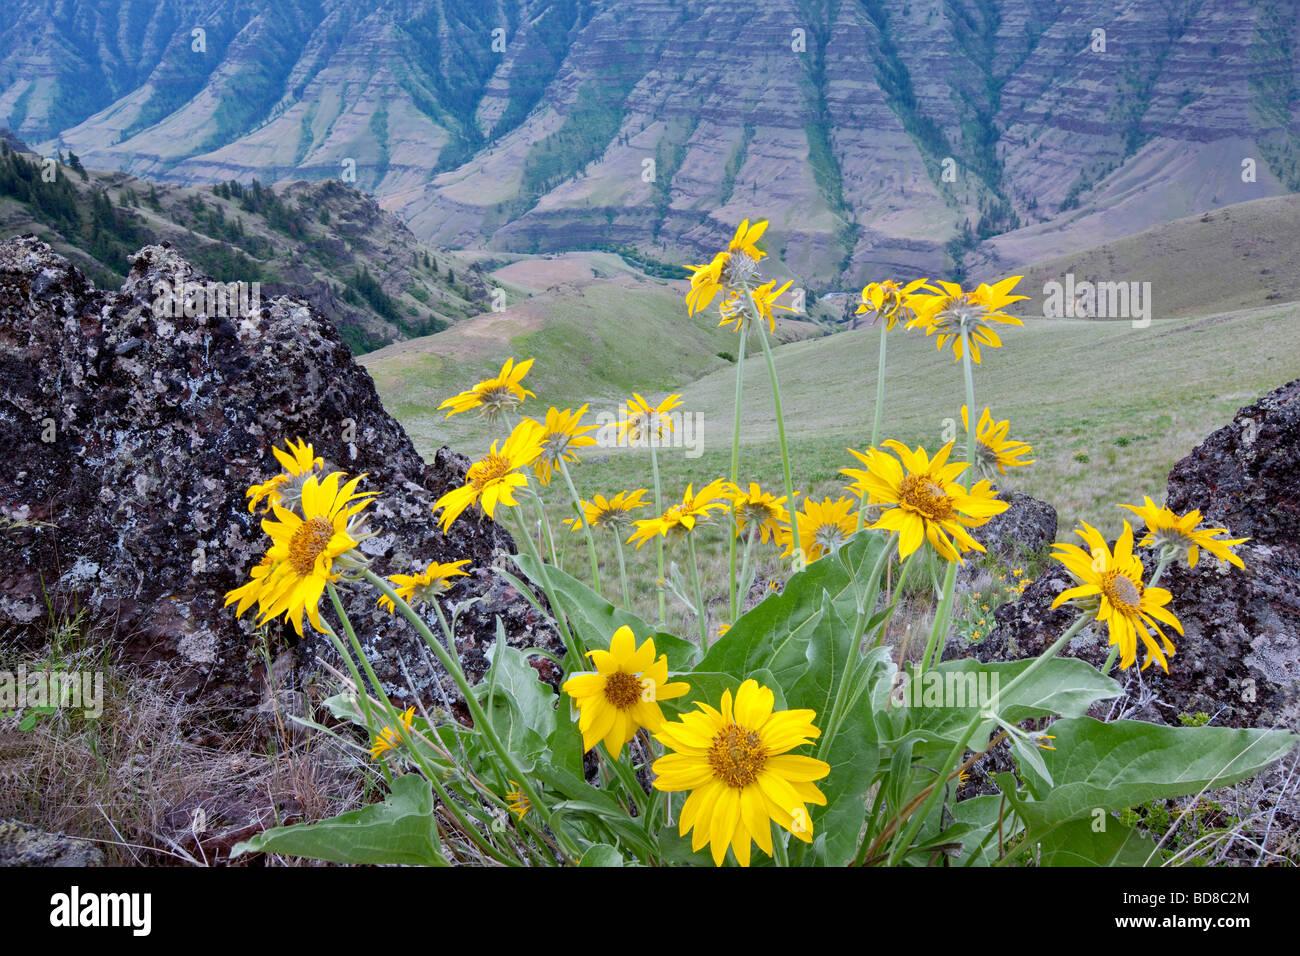 Imnaha Canyon with Balsomroot flowers Hells Canyon National Recreation Area Oregon - Stock Image